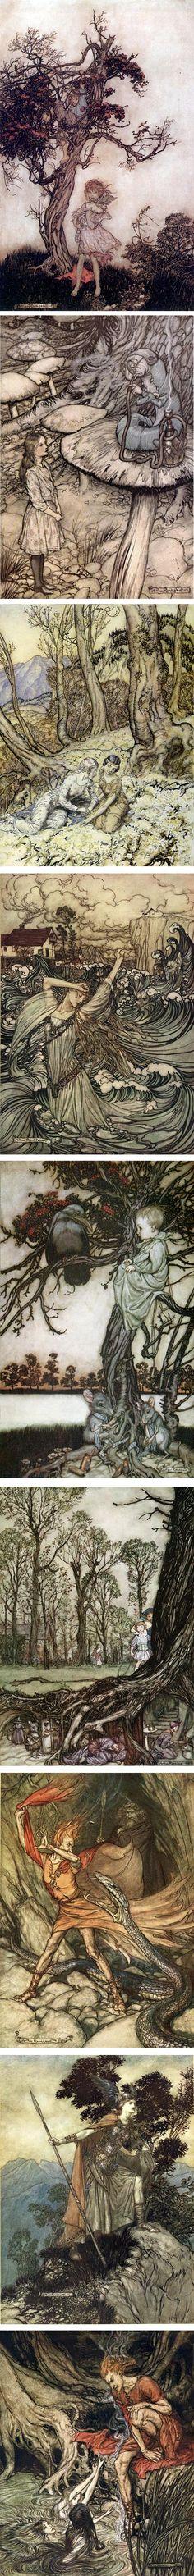 Arthur Rackham: Rip van Winkle, Alice's Adventures in Wonderland, Peter Pan in Kensington Gardens, Undine, The Ring of the Niblung